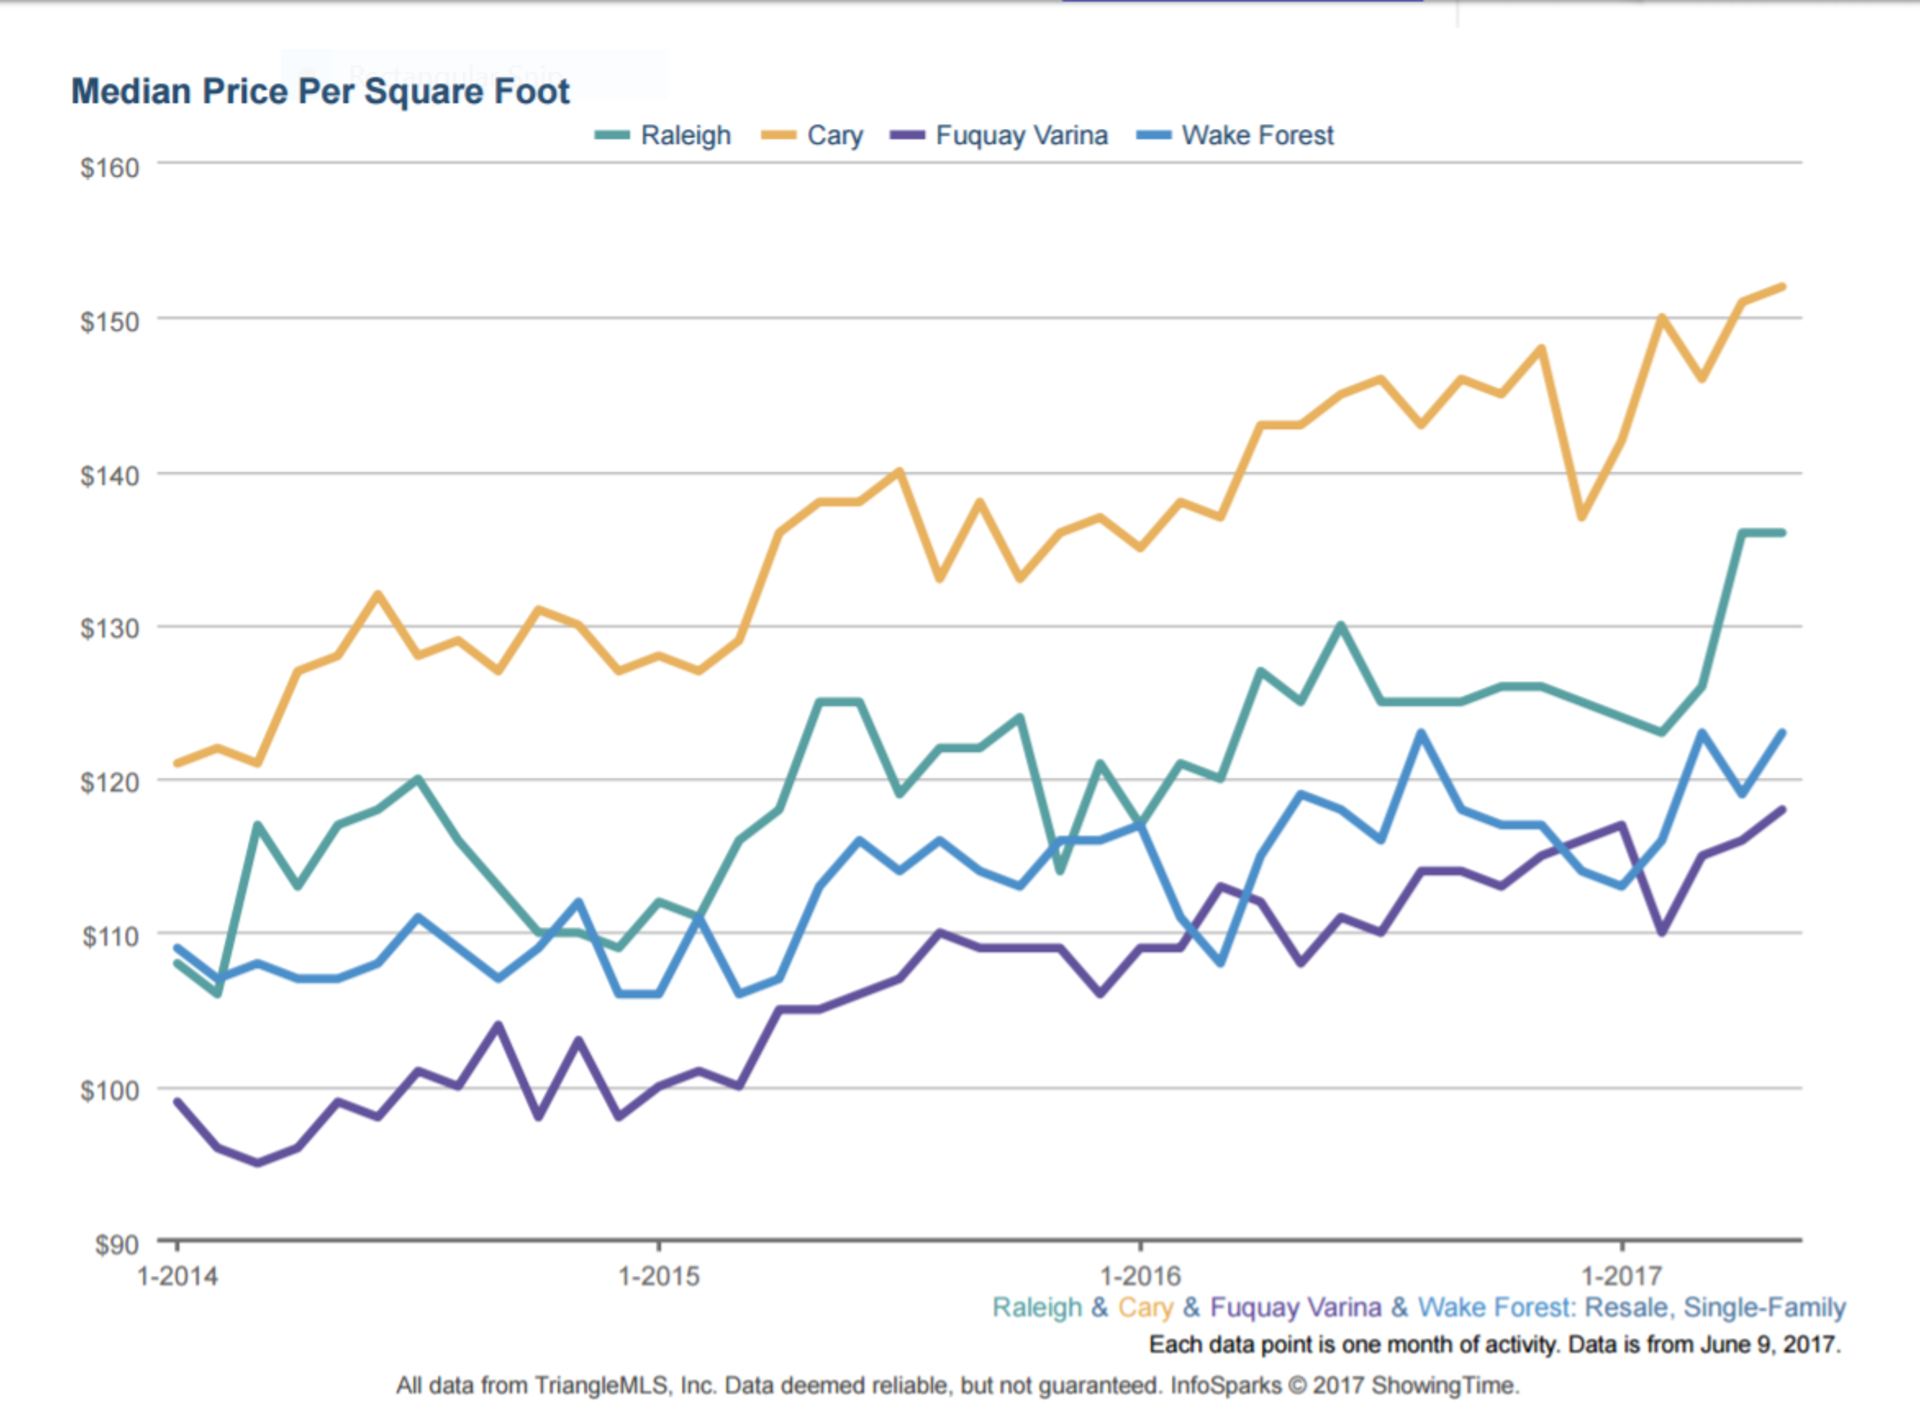 Sales Price Per Square Foot Data for Wake County